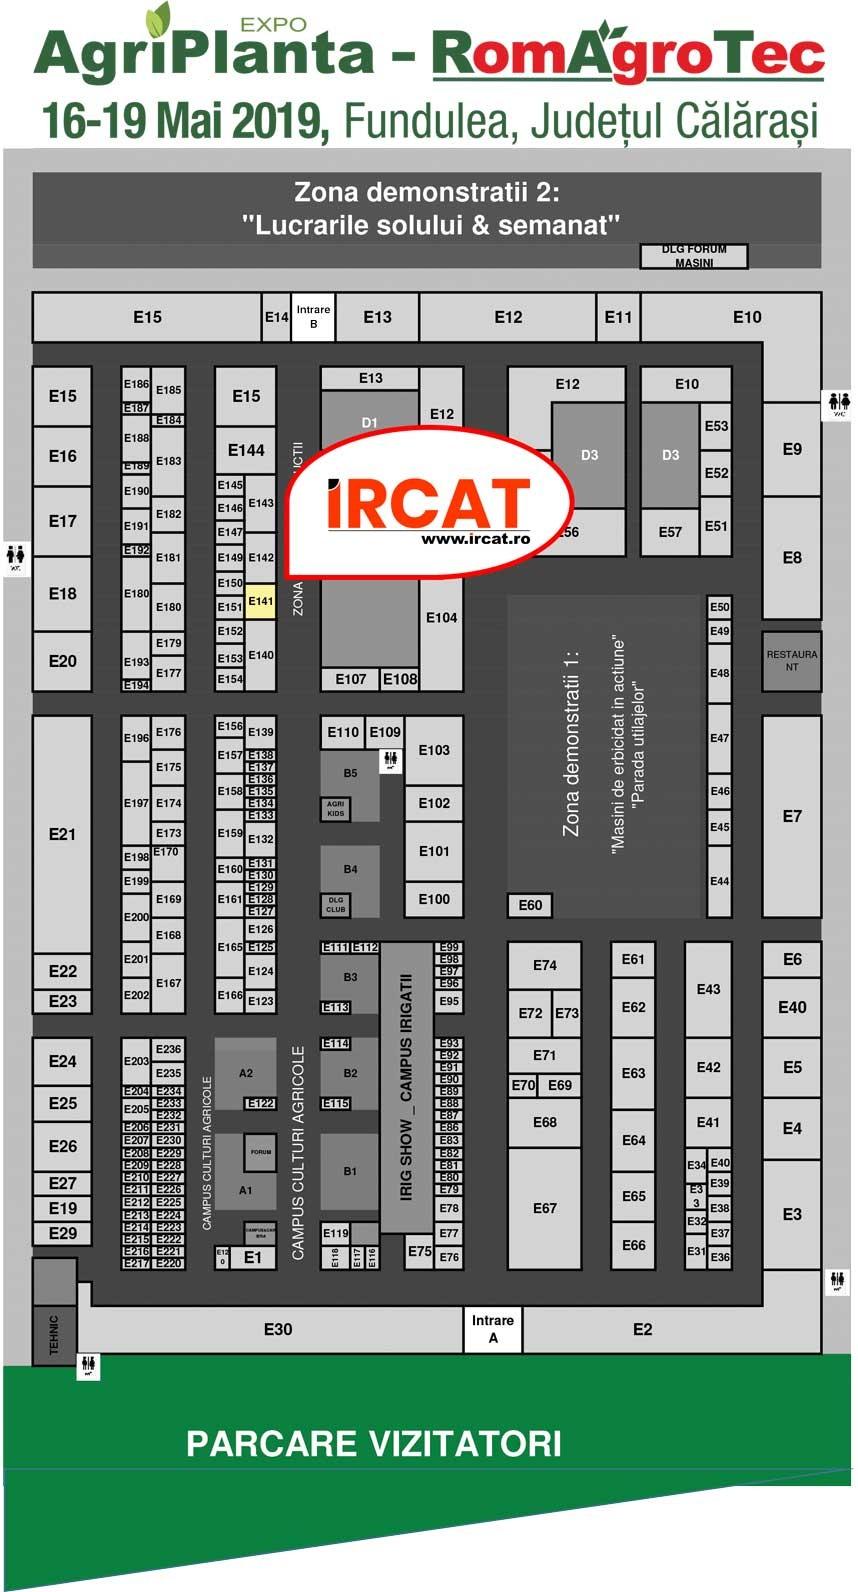 Harta targ Agriplanta 2019 - Stand Ircat E141